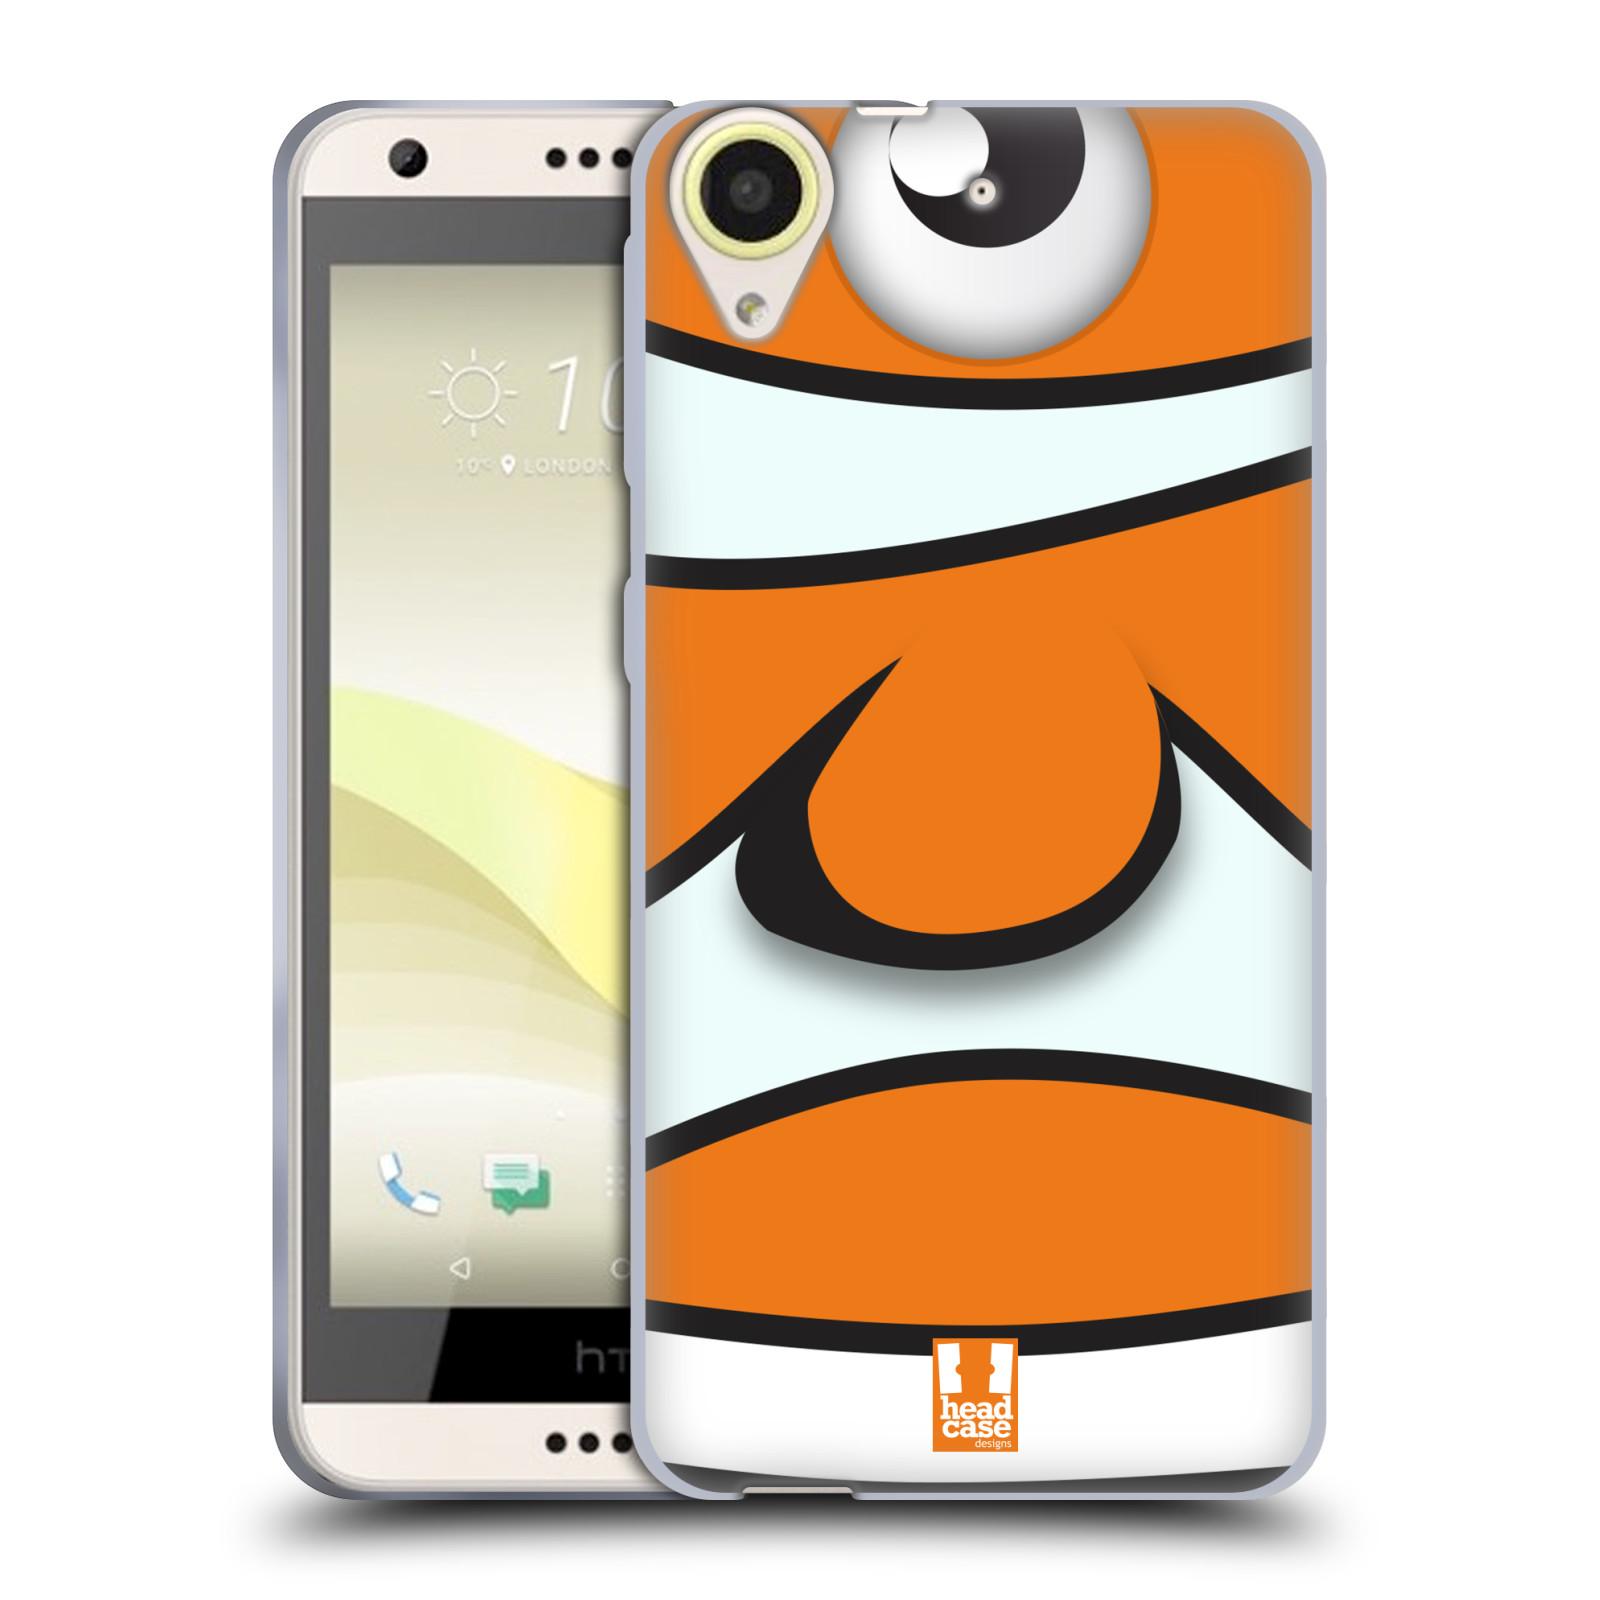 HEAD CASE silikonový obal na mobil HTC Desire 650 vzor Rybičky z profilu klaun oranžová NEMO